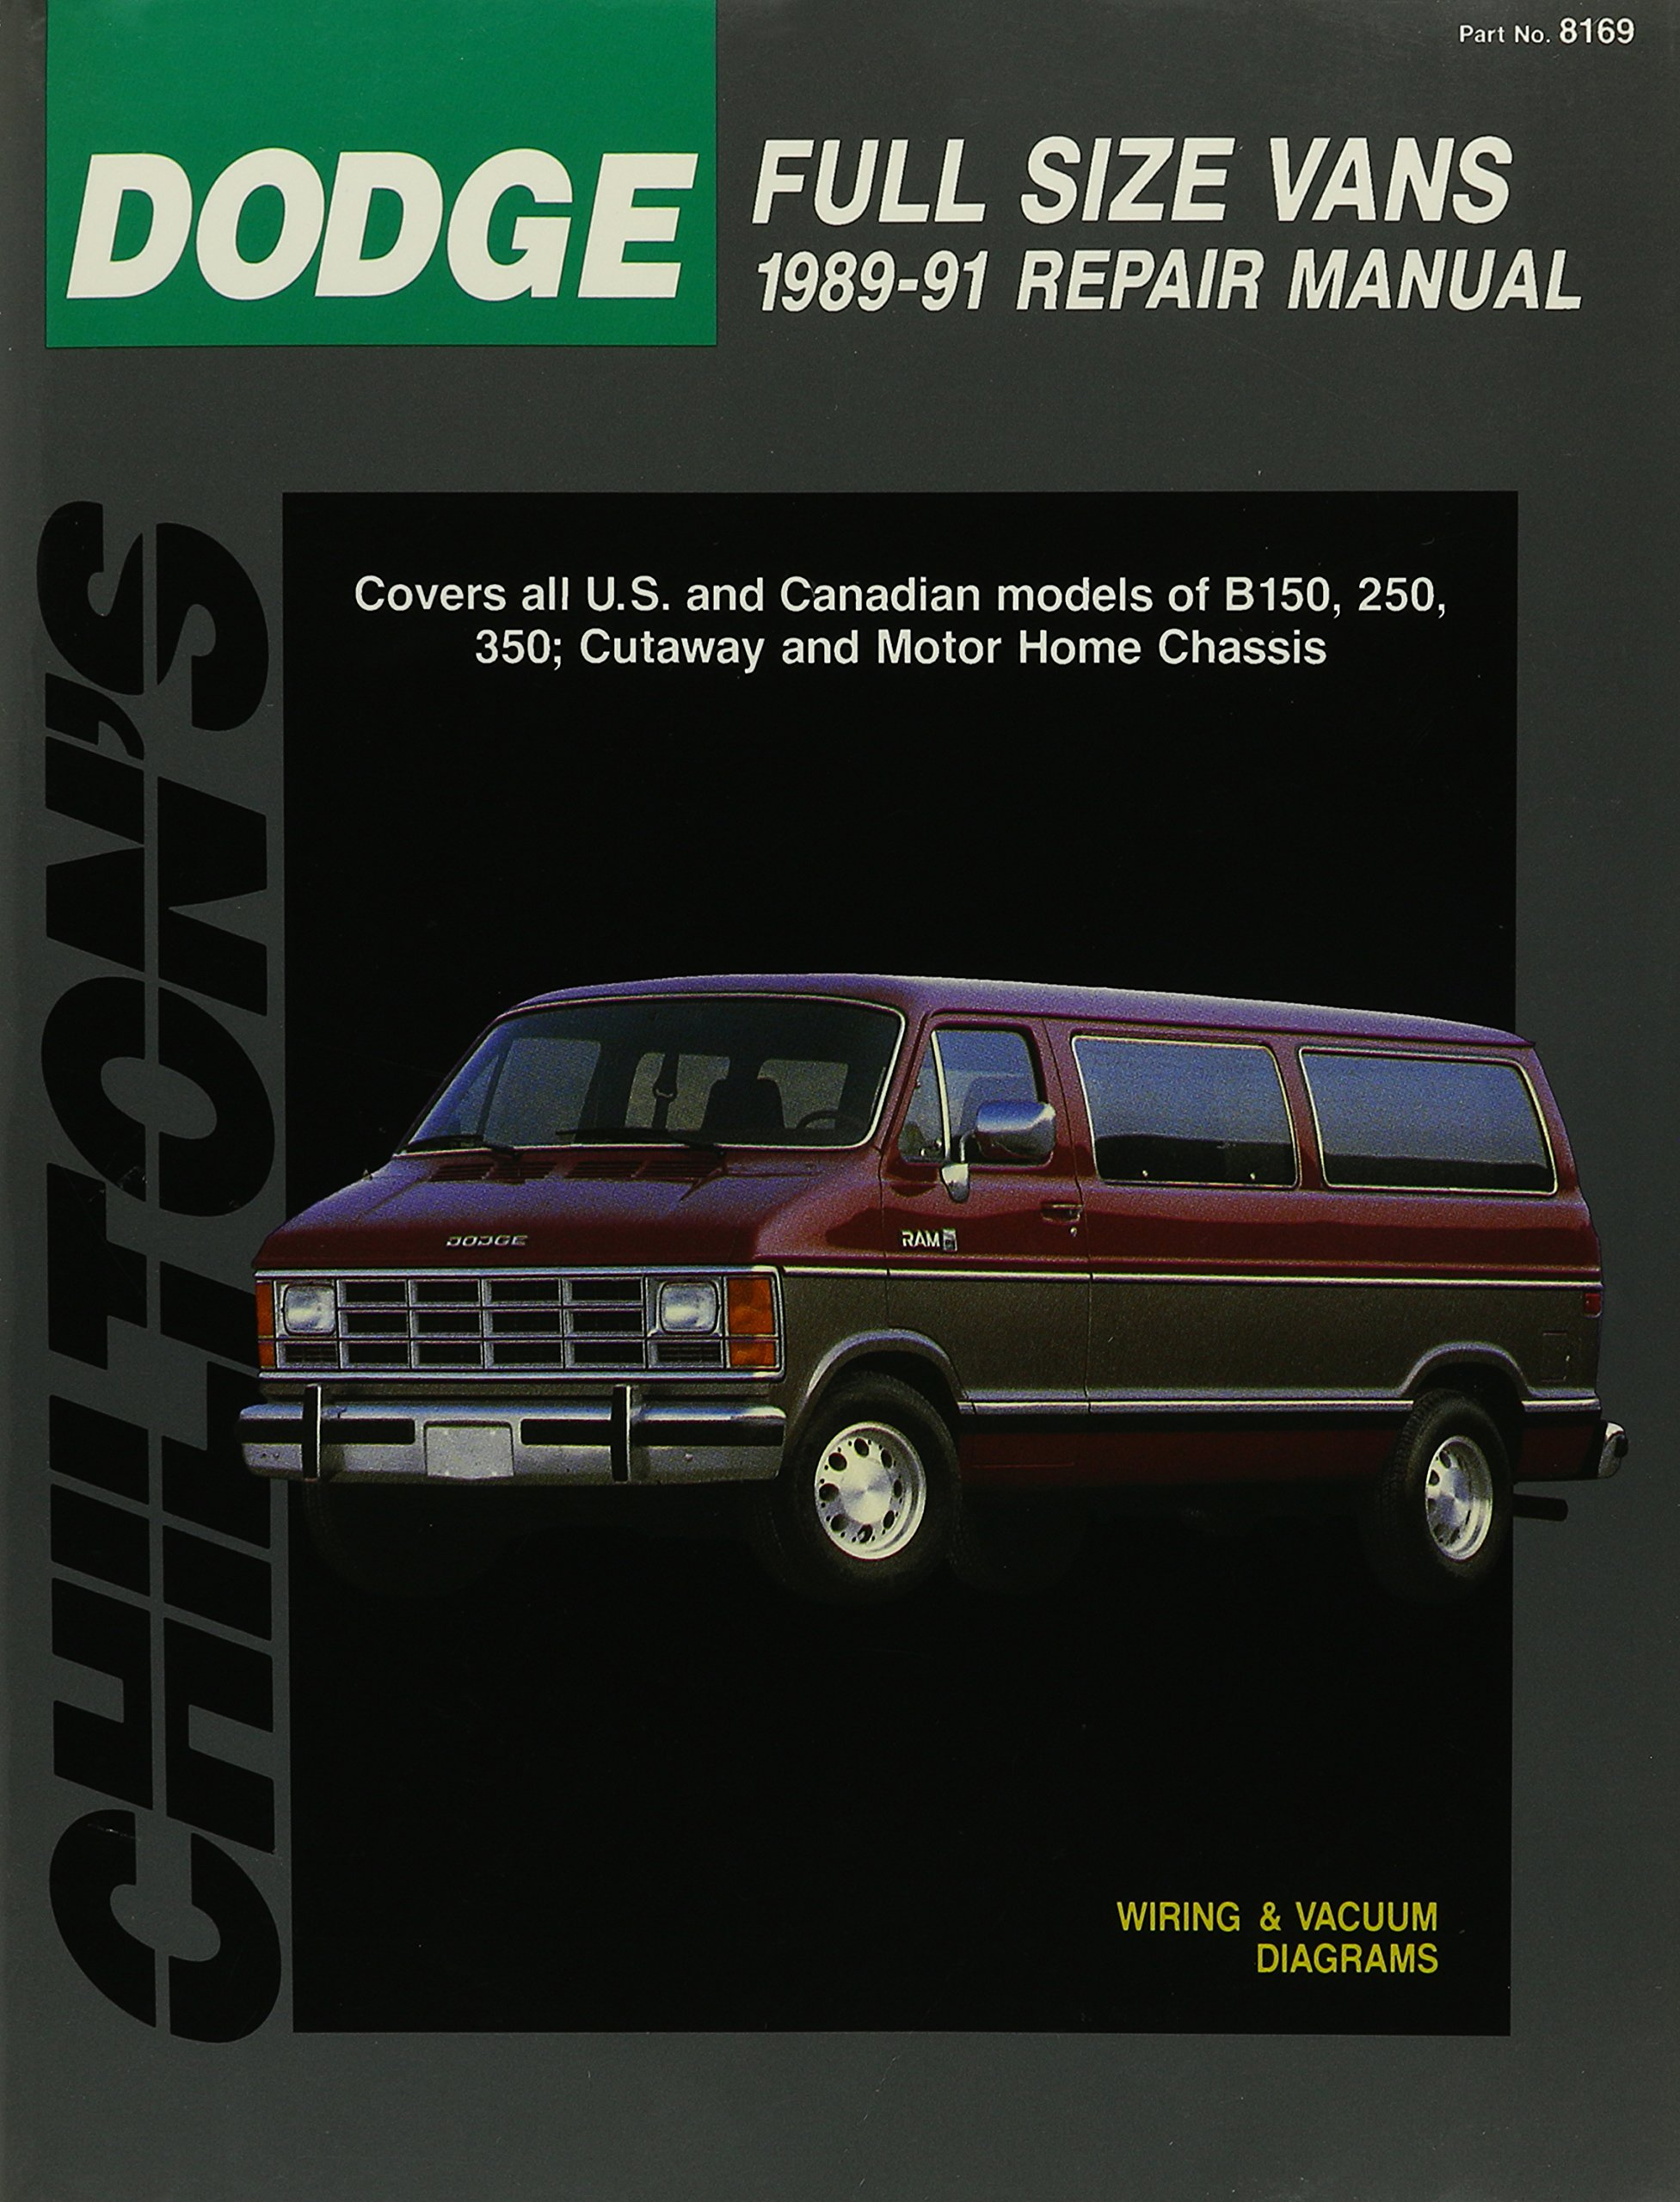 Chilton's Ford Full Size Vans 1989-91 Repair Manual (Total Car Care  Series): Chilton's Automotive Editorial Dept, Richard J. Rivele:  9780801981579: ...